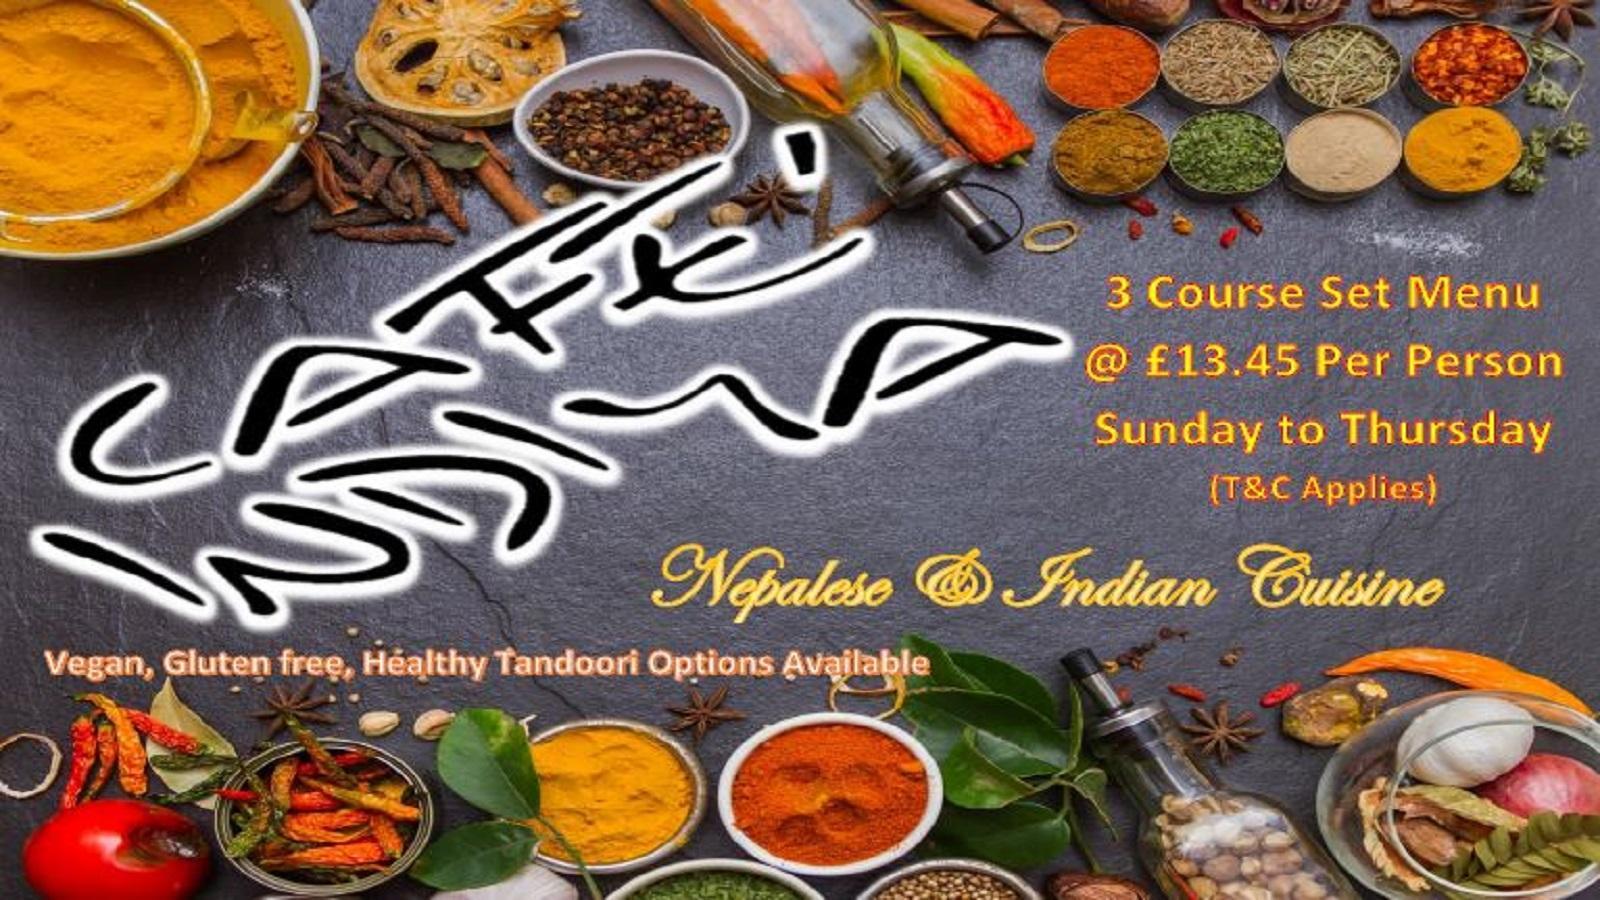 Cafe Indiya